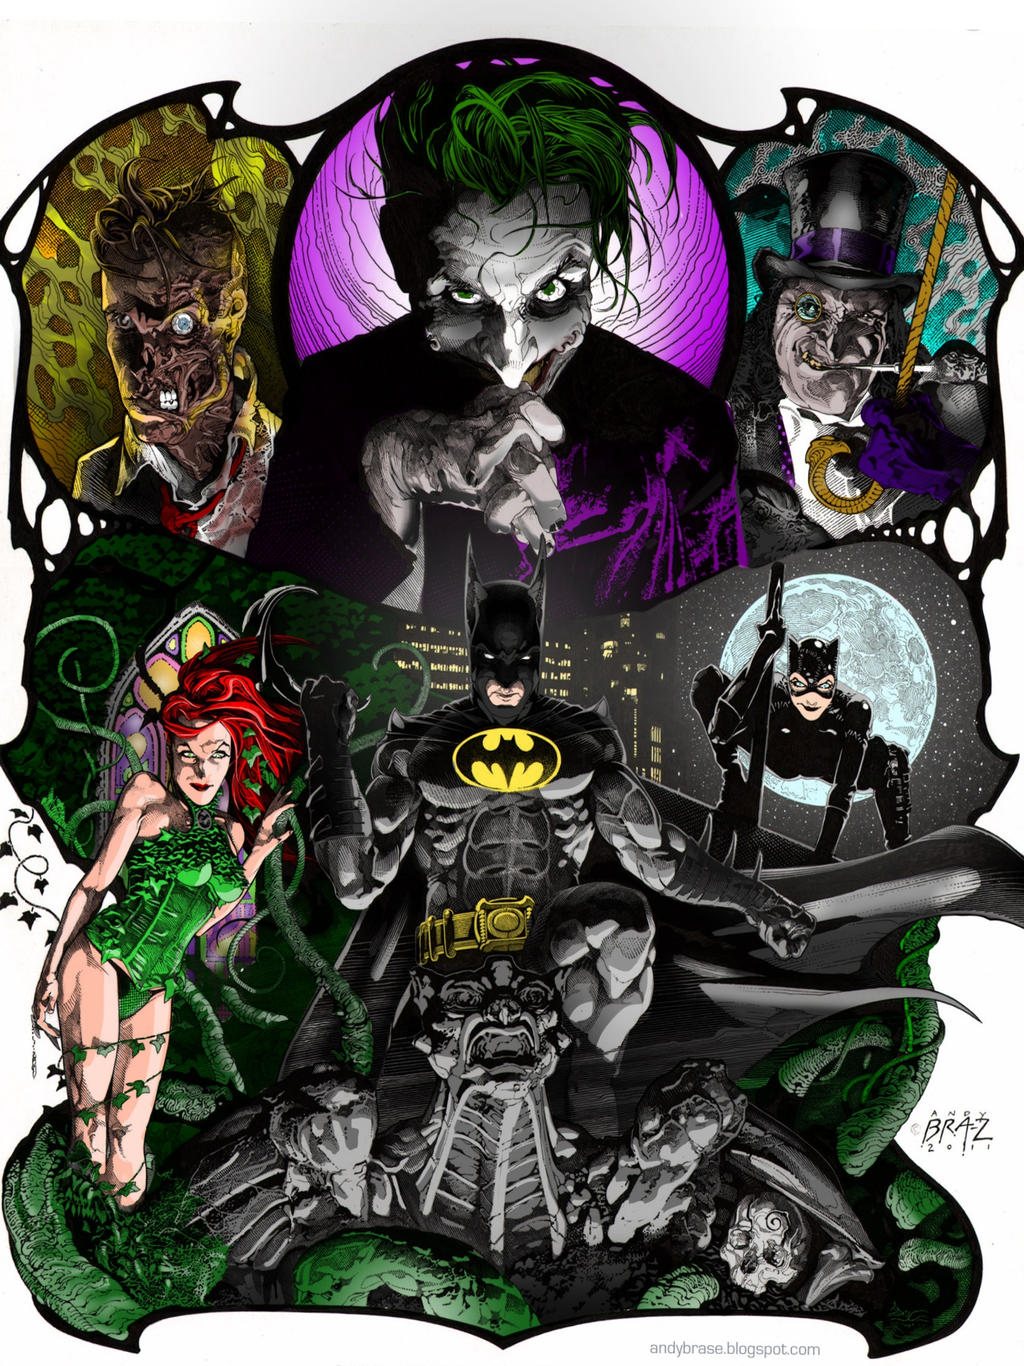 BATMAN AND FOES by CThompsonArt